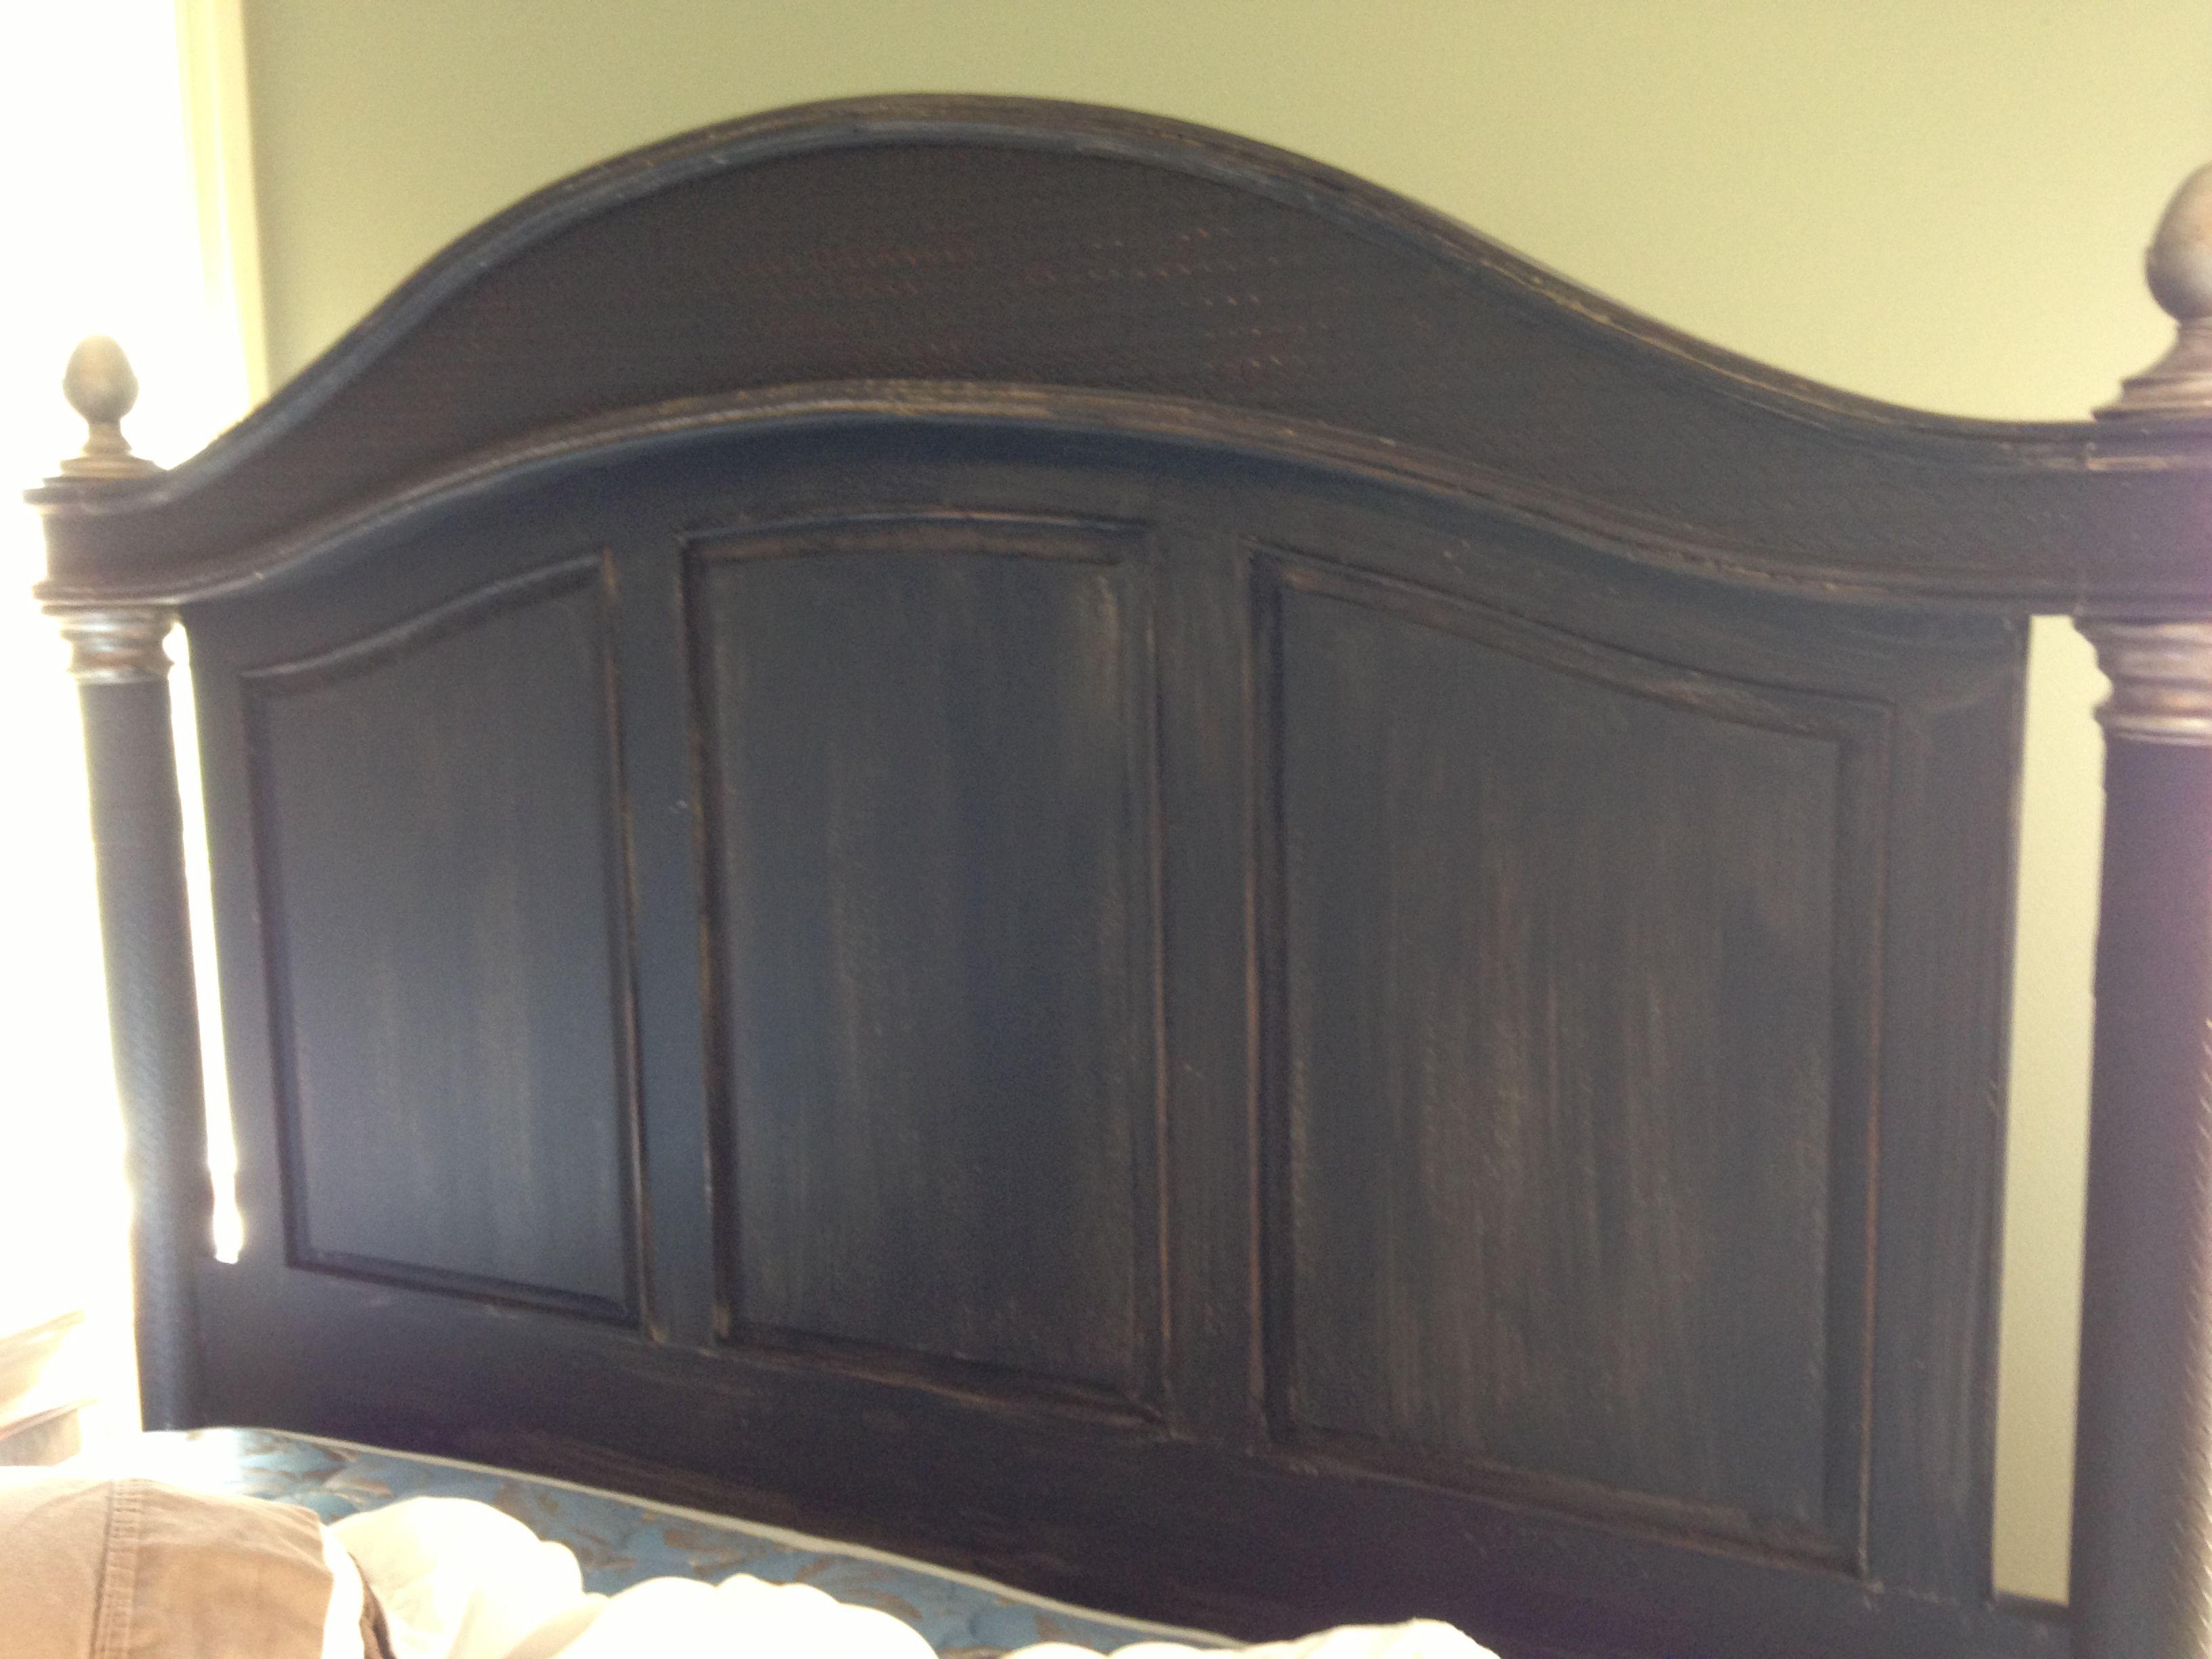 Distressed Black Painted Headboard White Washed Furniture Black Headboard Headboard